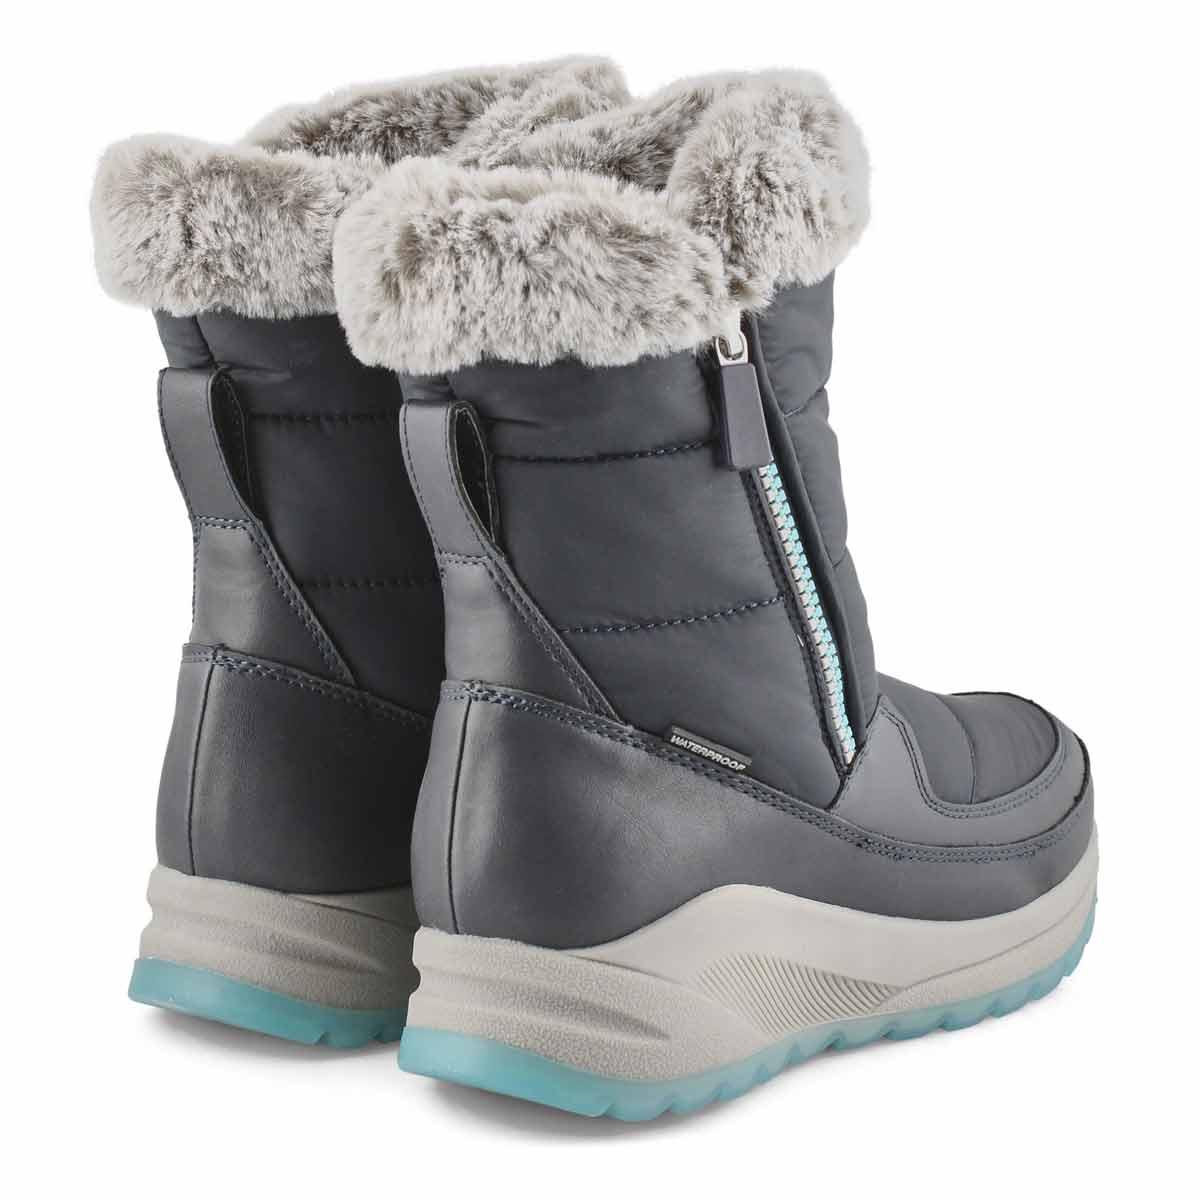 Women's SEISMIC navy waterproof winter boots